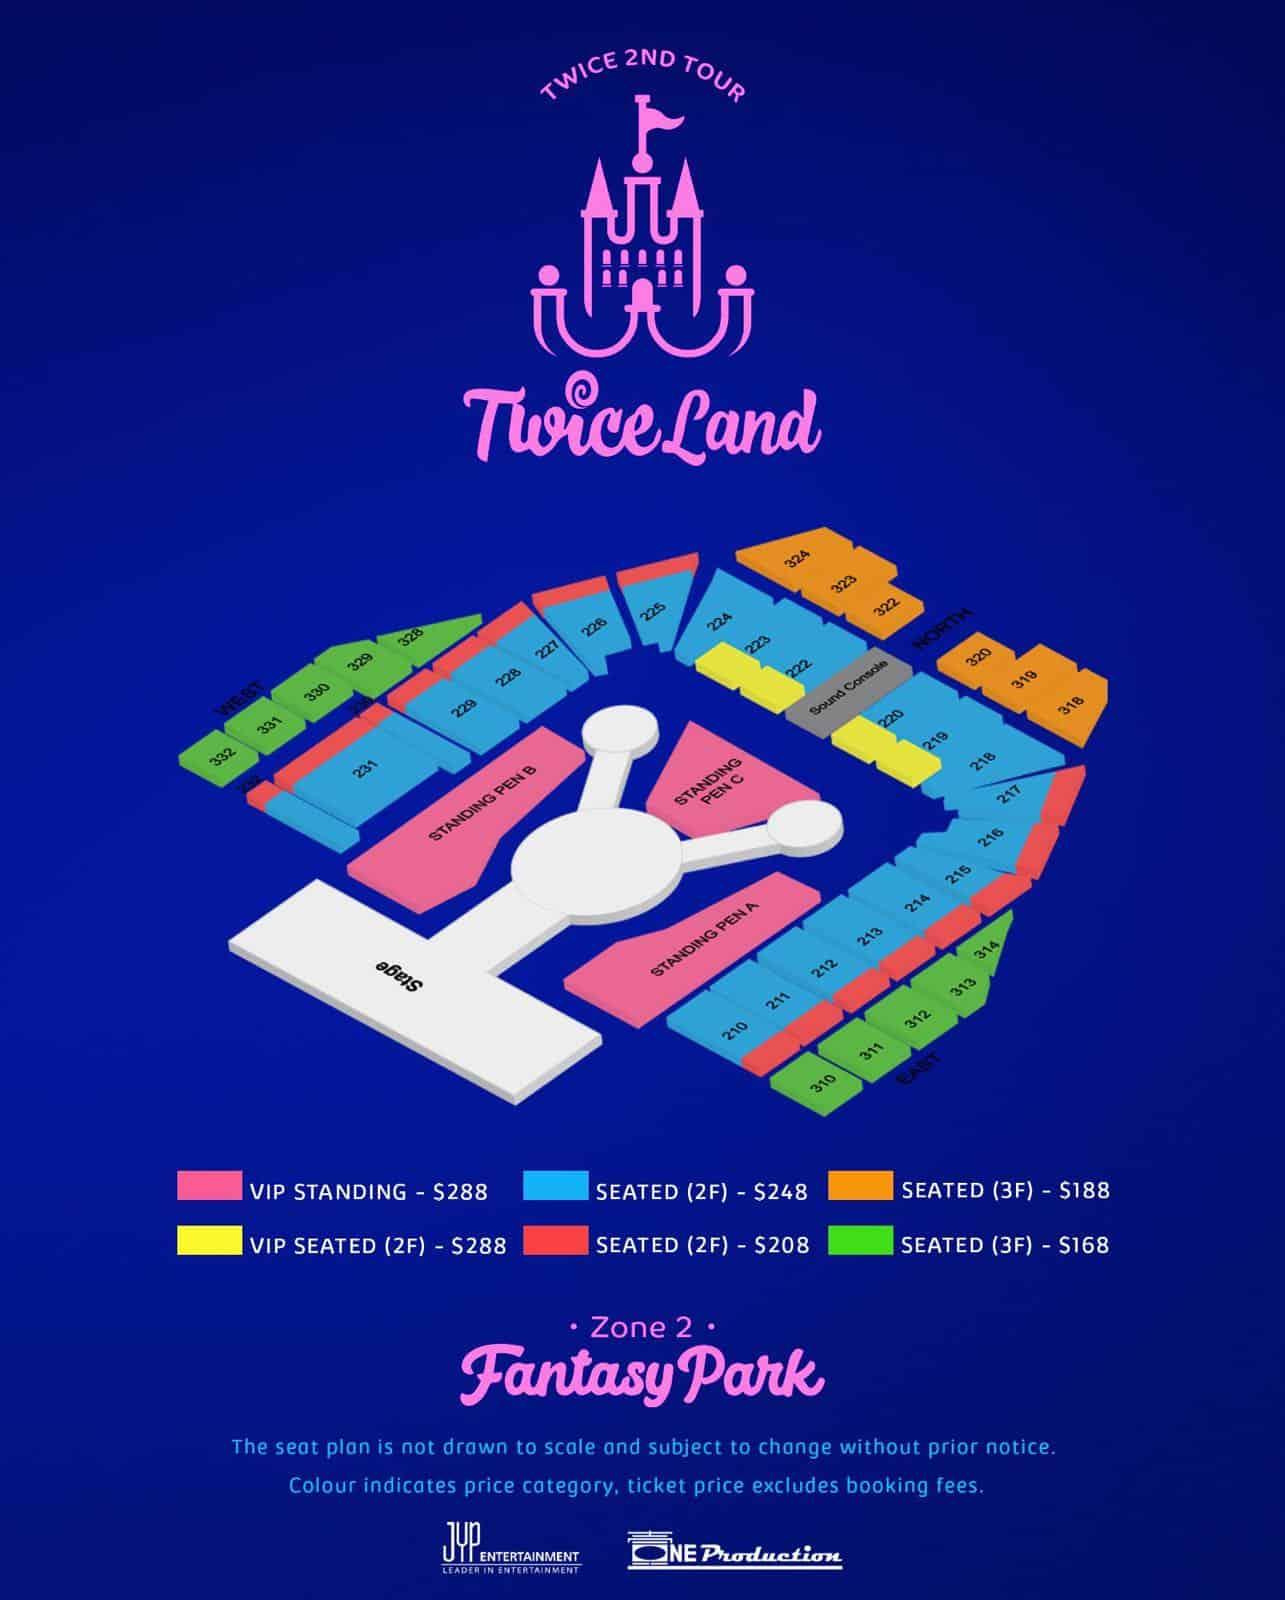 TWICELAND Zone 2 Fantasy Park in Singapore